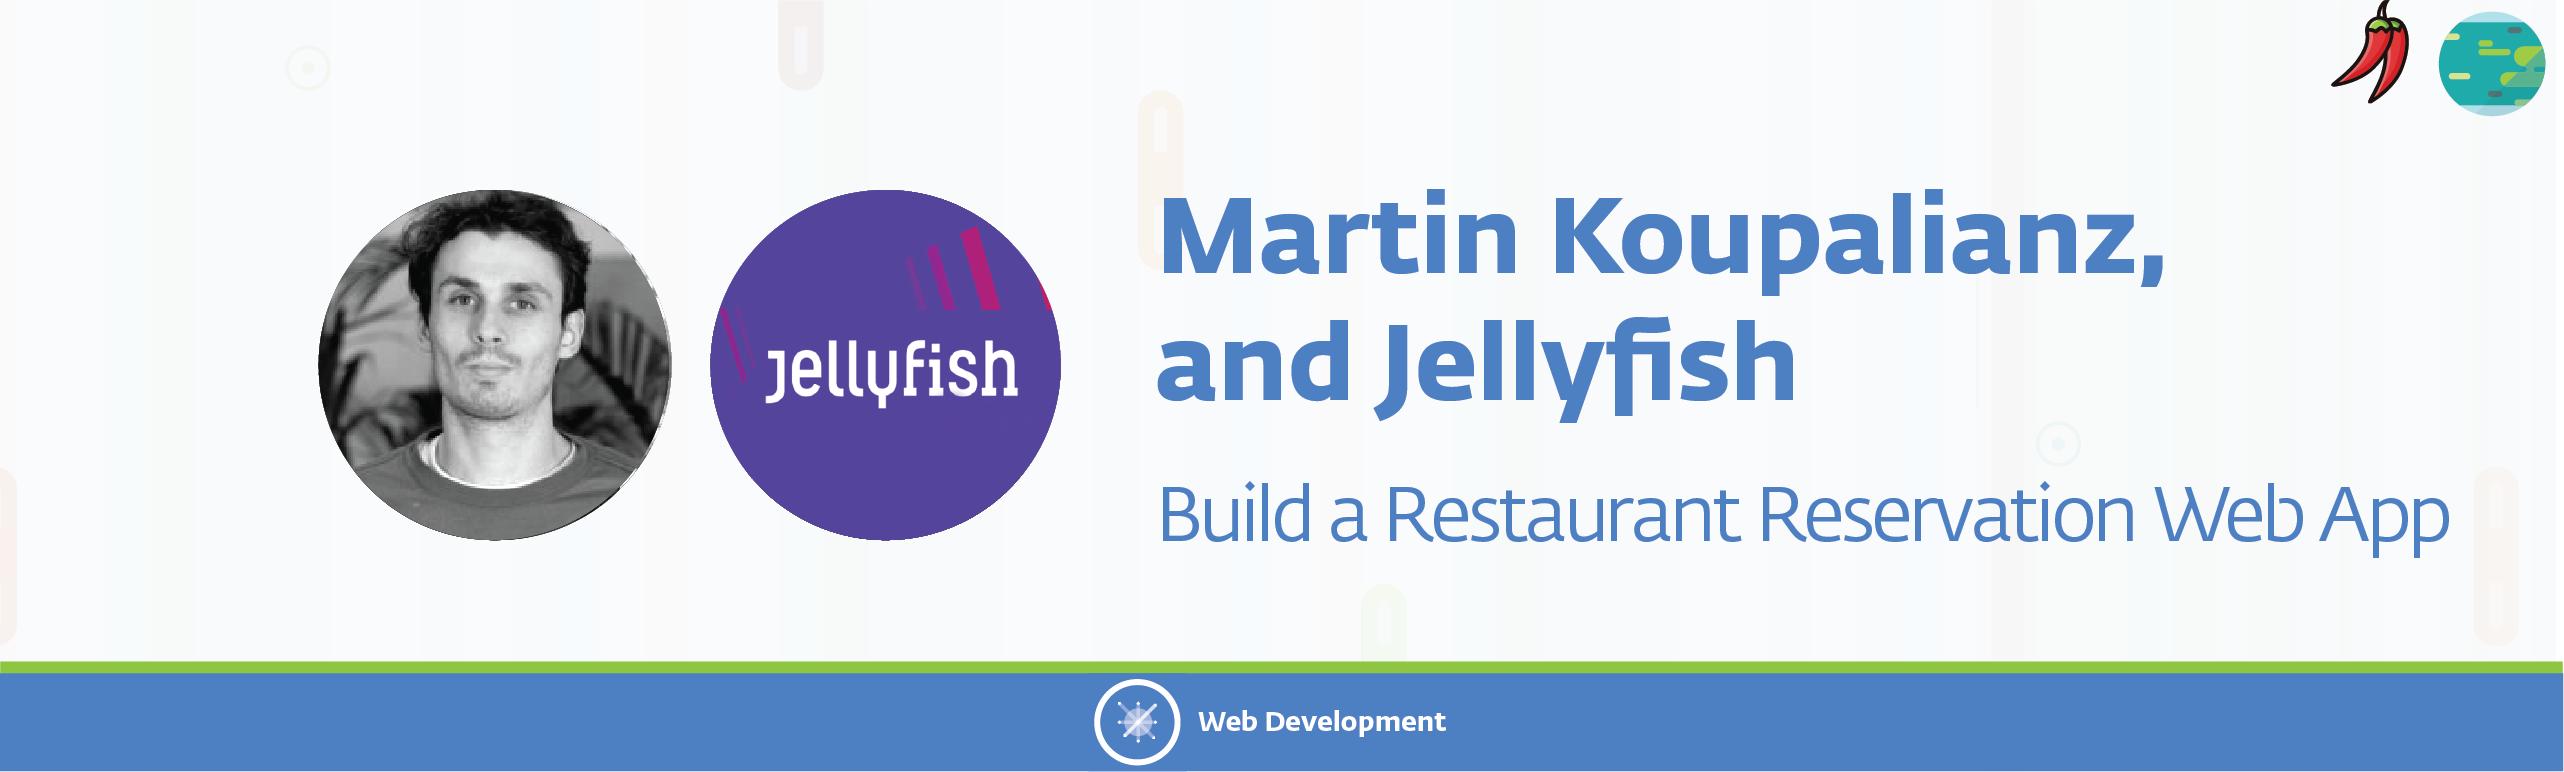 sep labs banner 11 - Build a Restaurant Reservation Web App